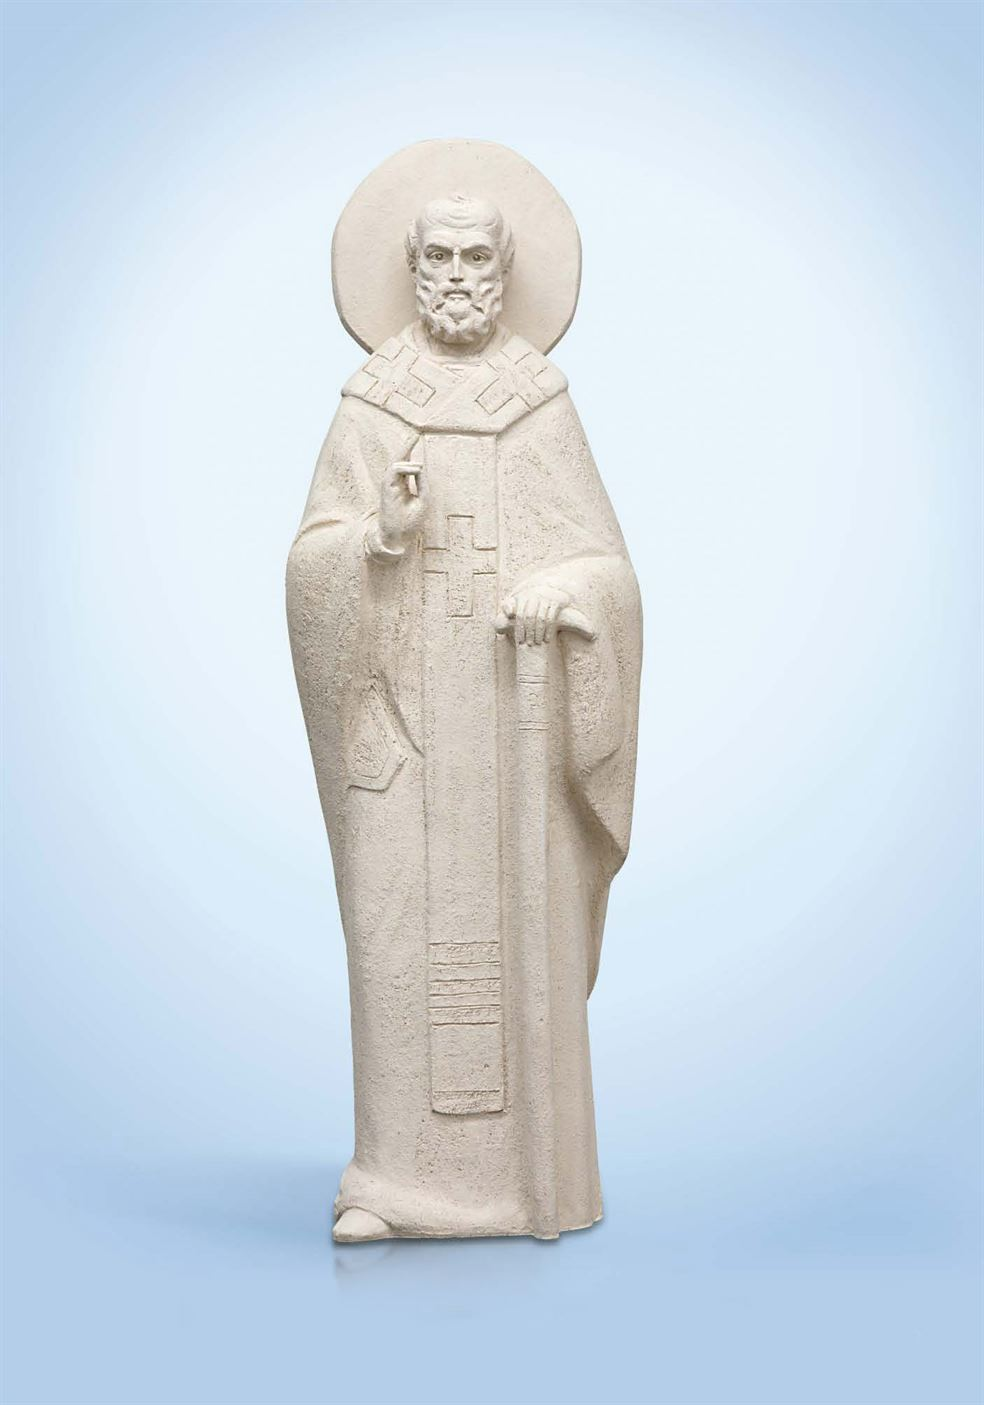 скульптура николай